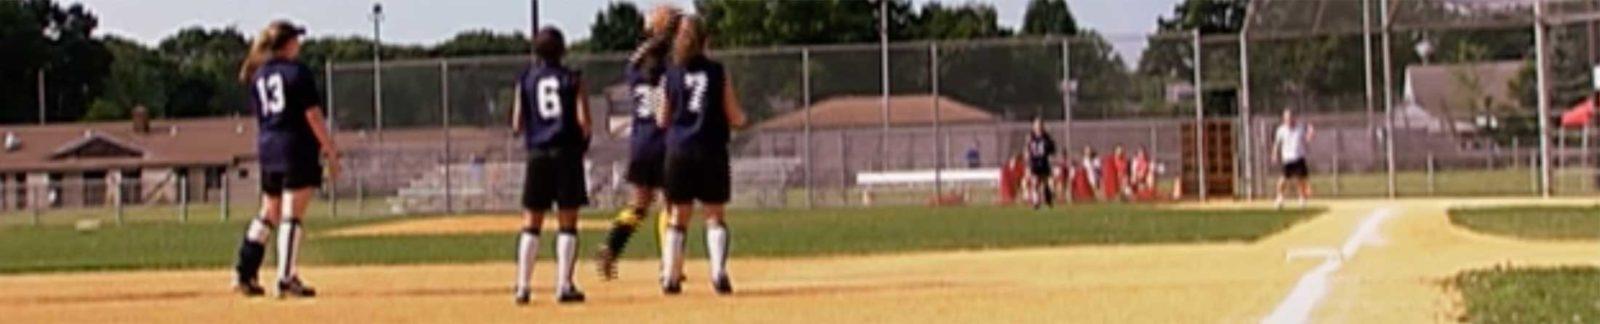 Hit to Right - baseball movie header